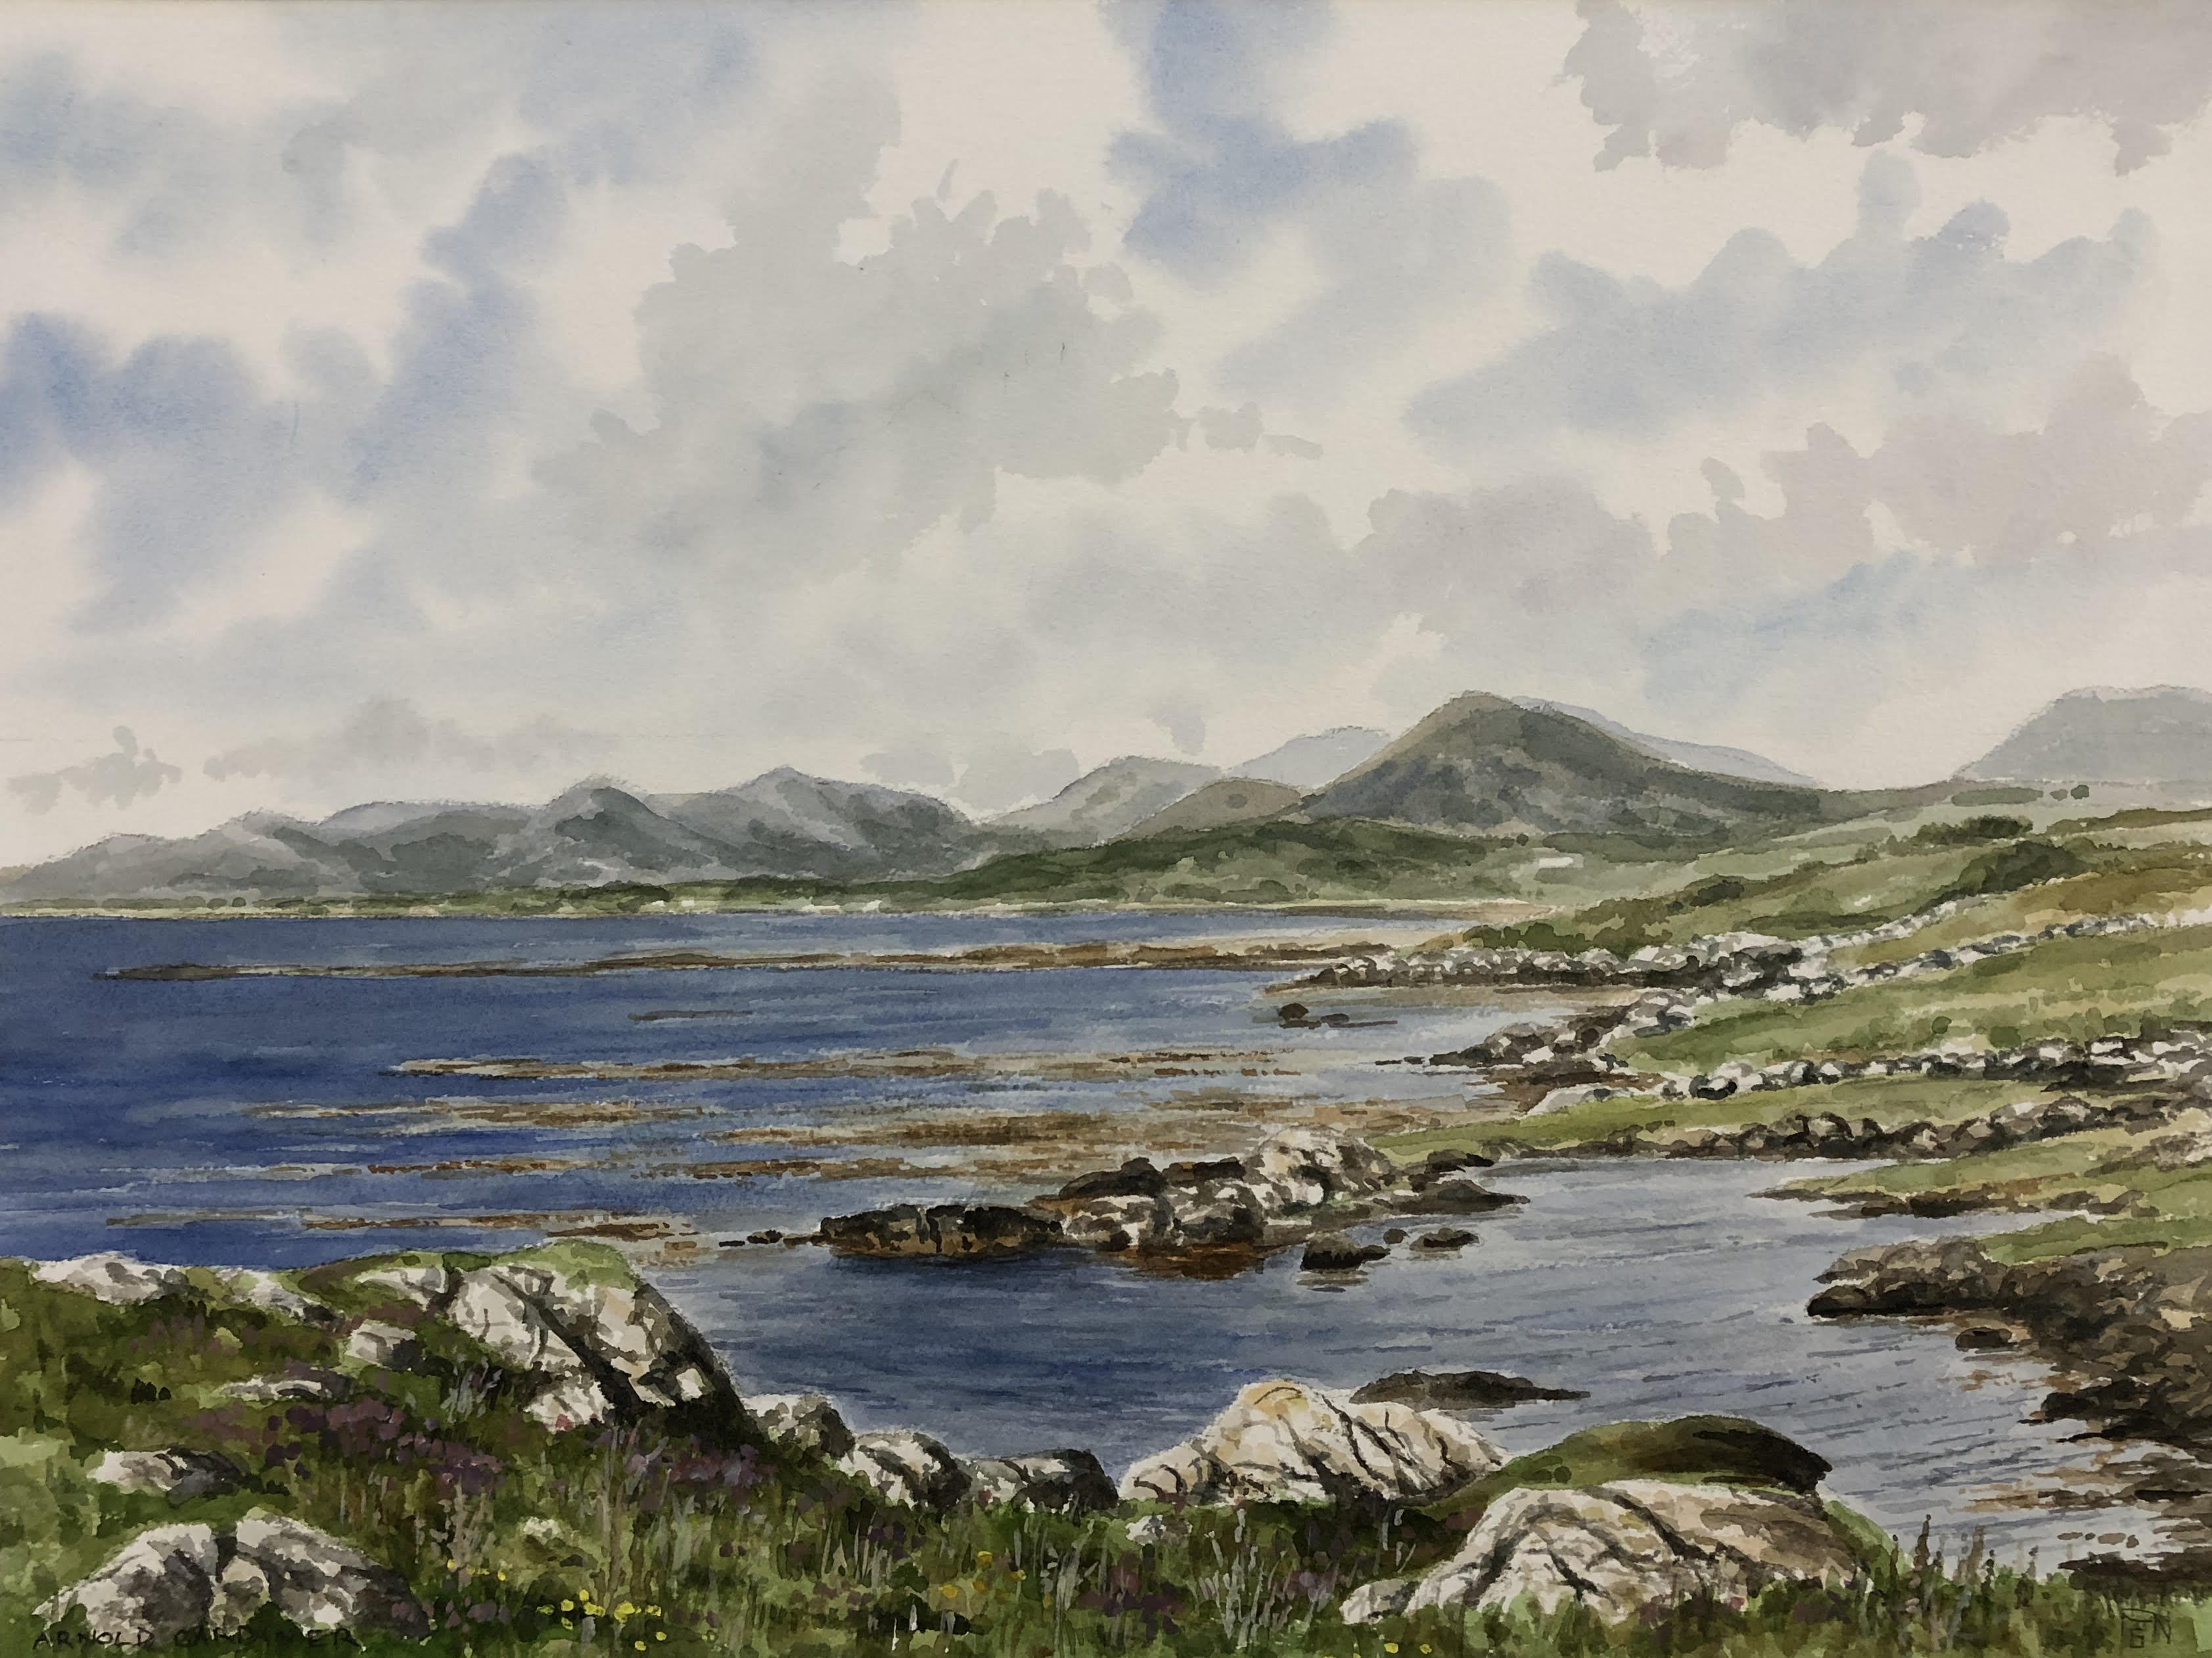 Bertraghboy Bay by Arnold Gardiner